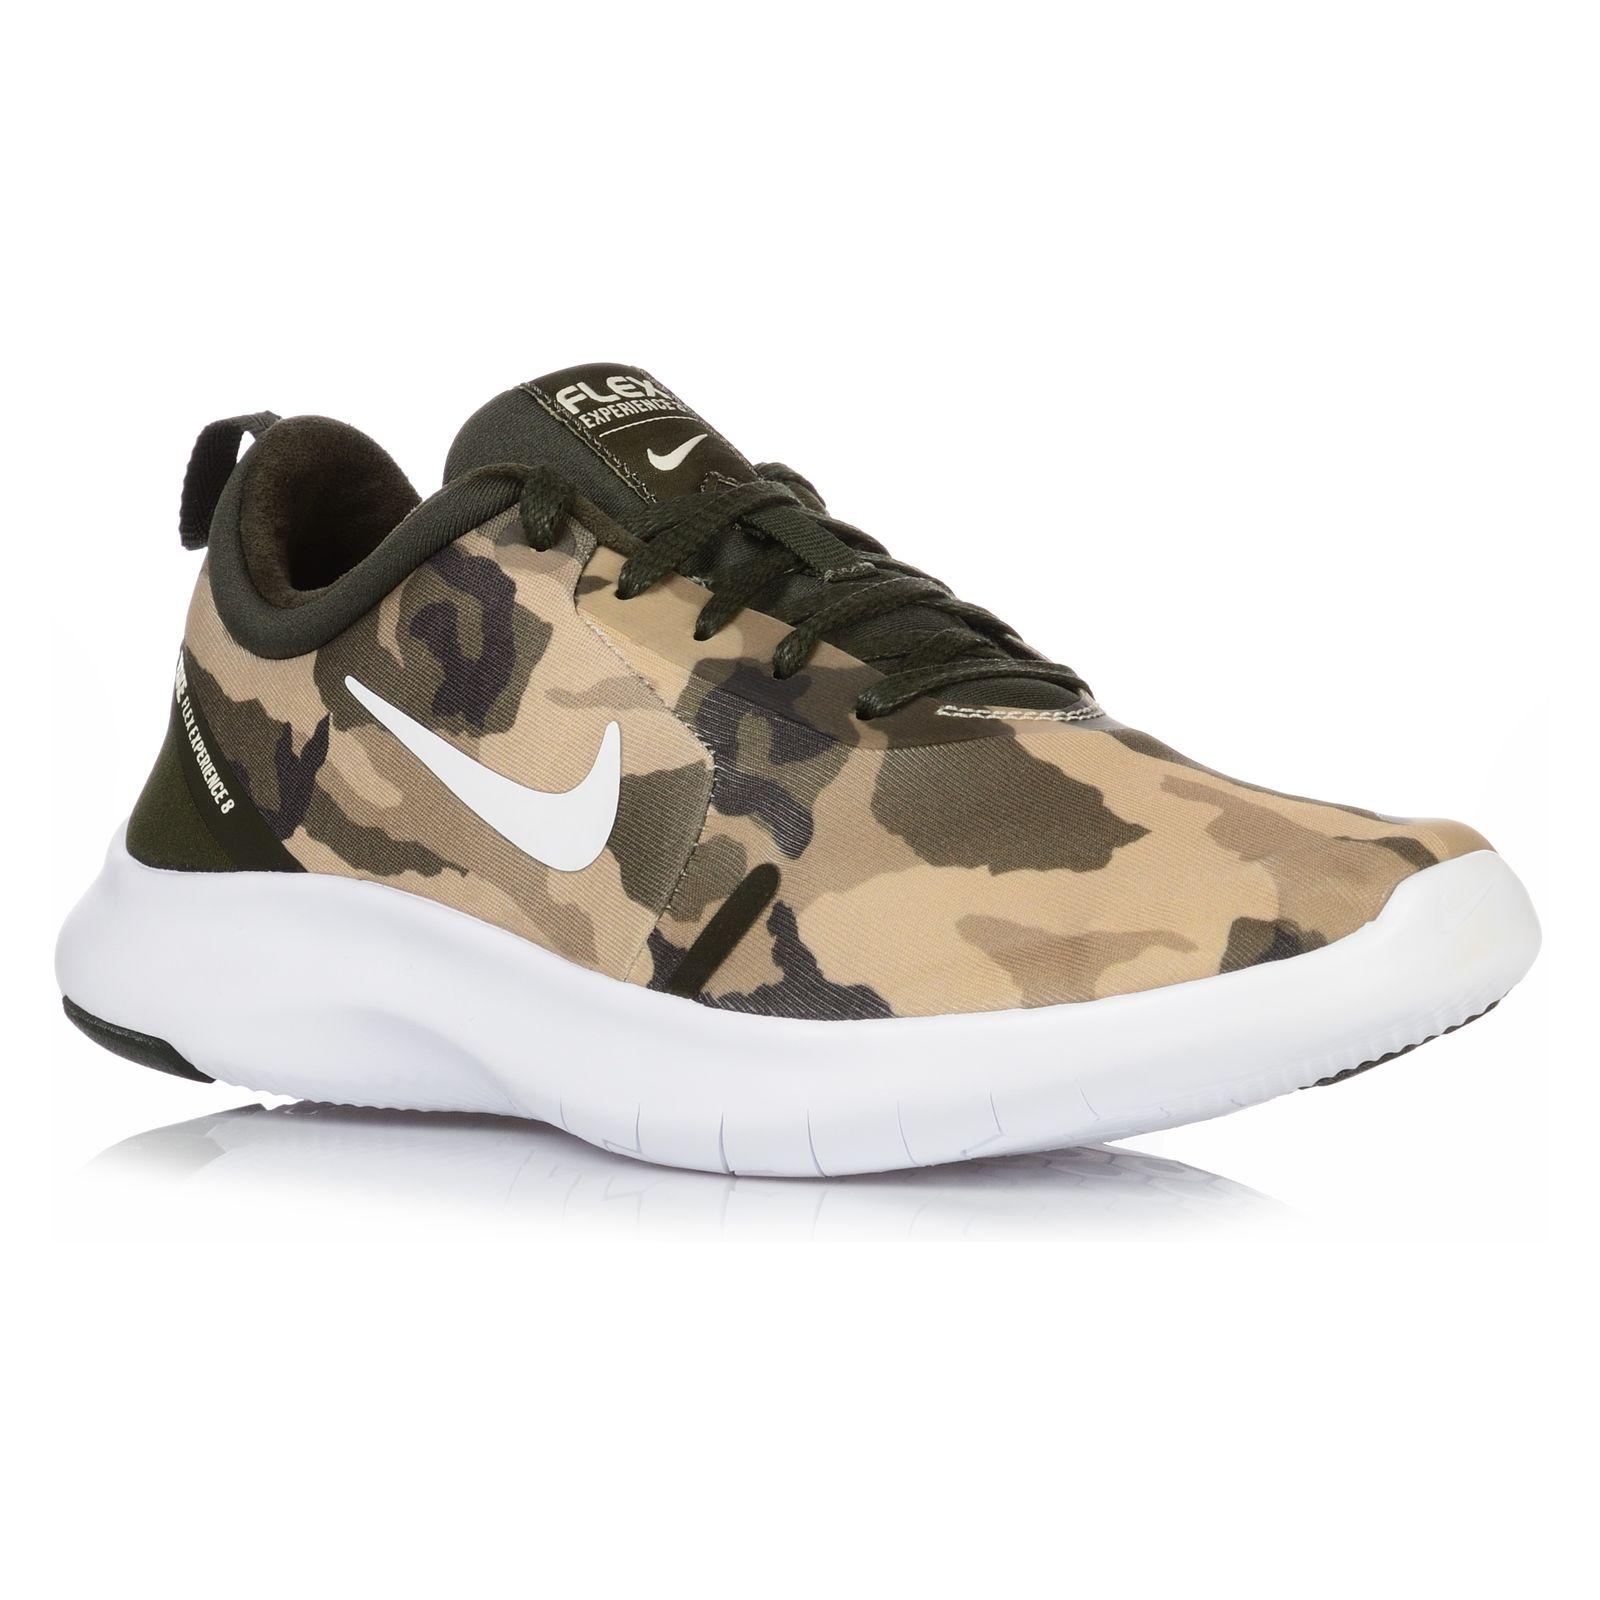 Sport Details Run Running Camo Schuhe Experience Zu 8 Flex Sportswear Sneakers Nike Shoe BxWrCoed